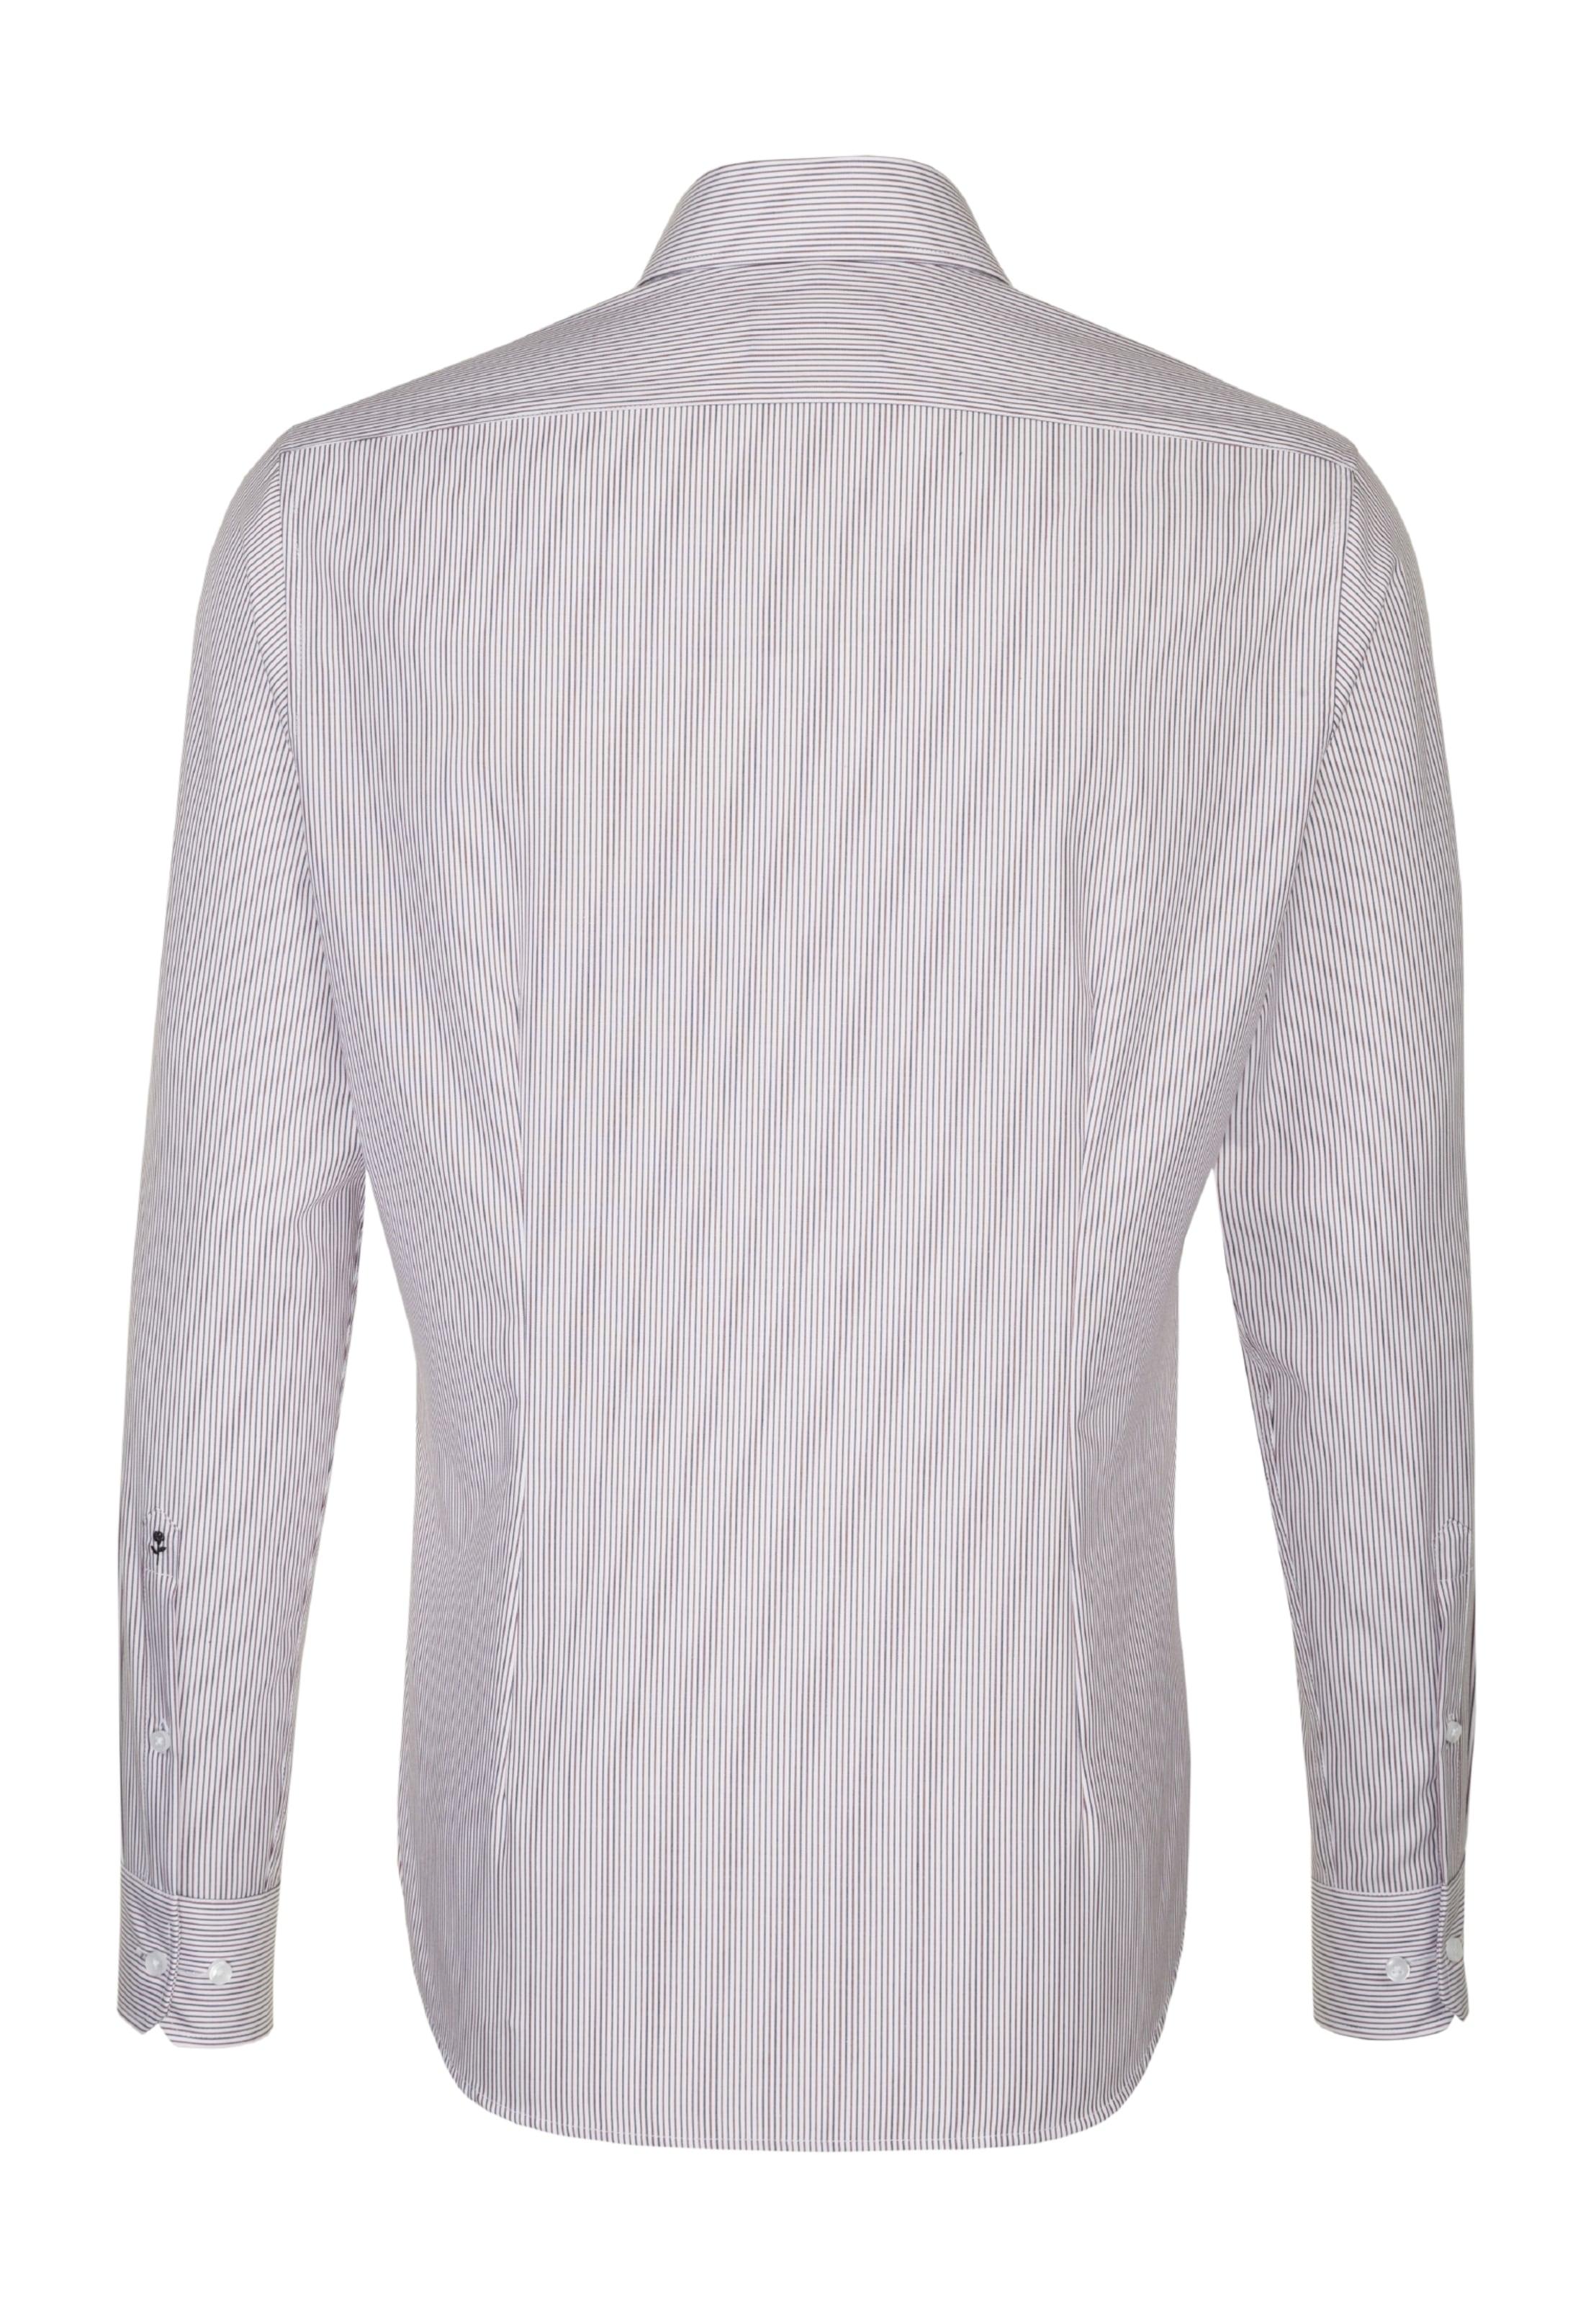 Seidensticker Hemd 'tailored' Business RotWeiß In Iyvmf6Yb7g